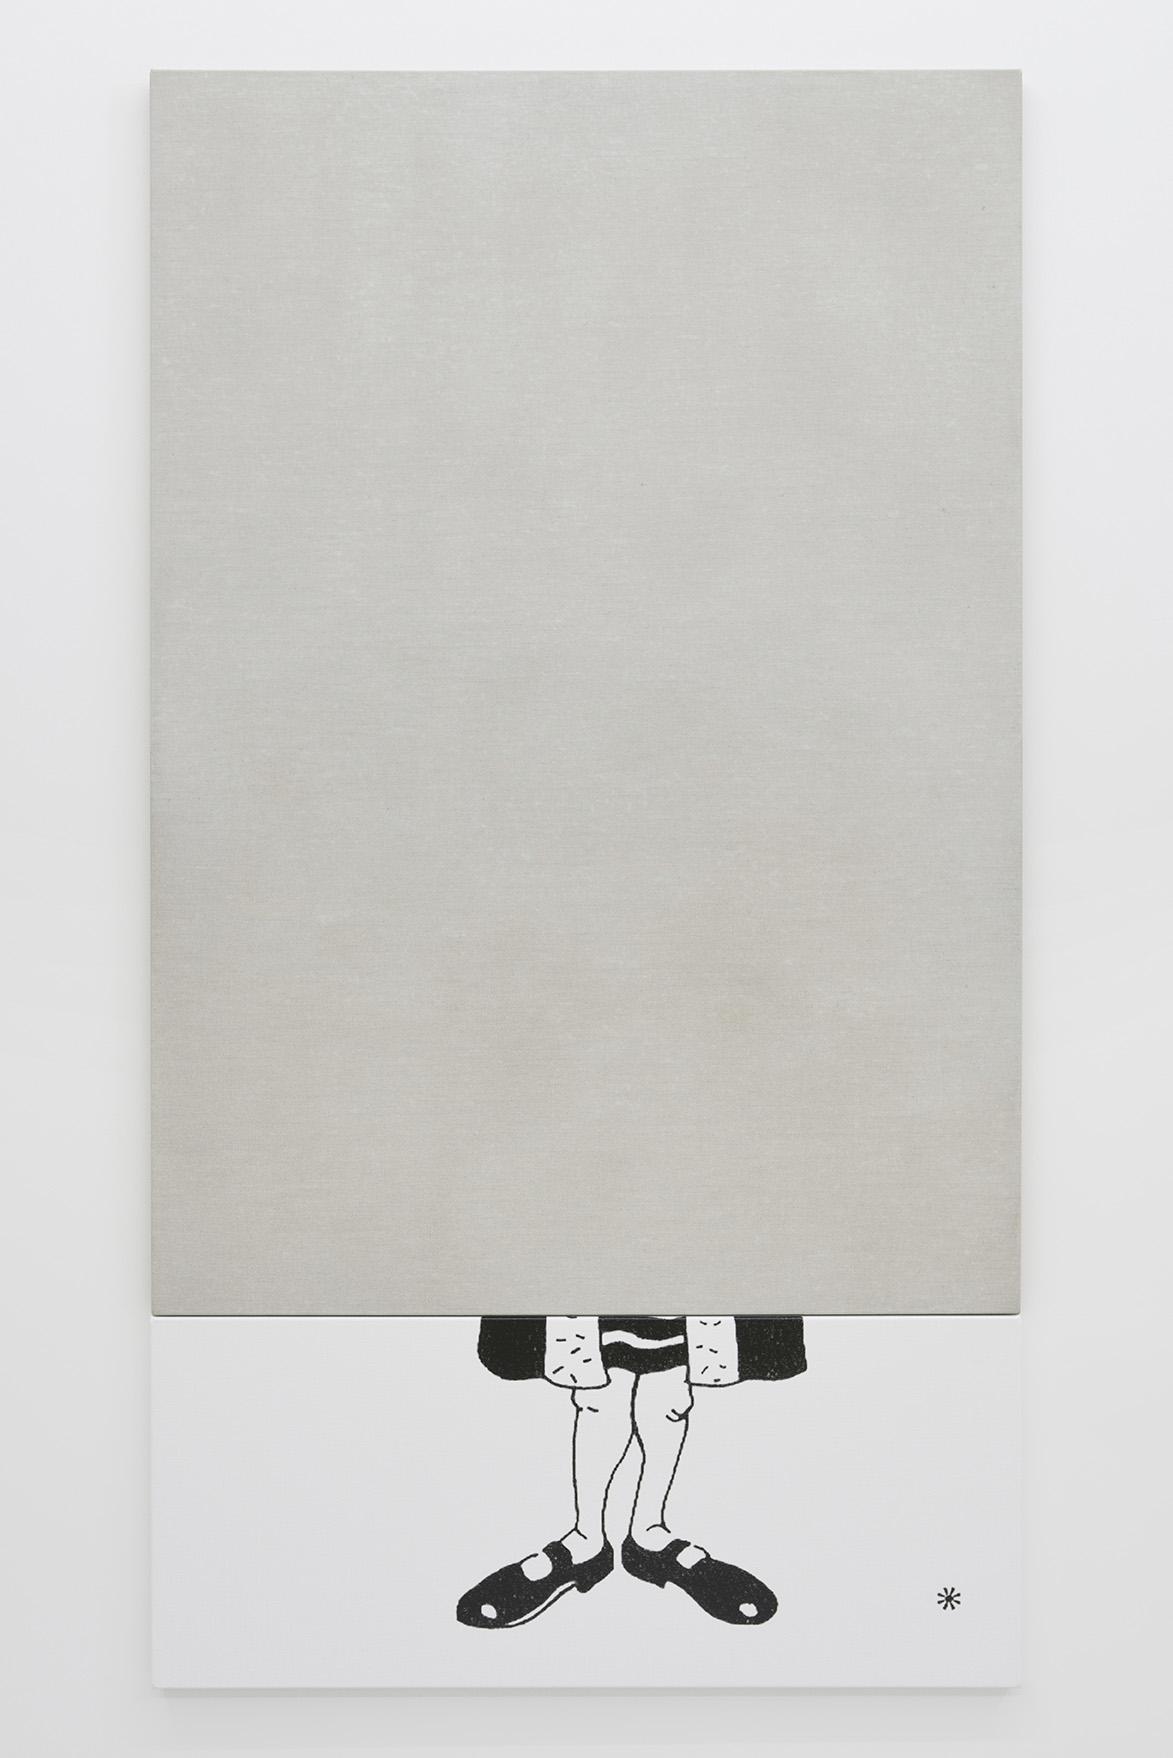 Oliver Osborne, Catherine Bastide gallery, Brussels, exhibition view 2015